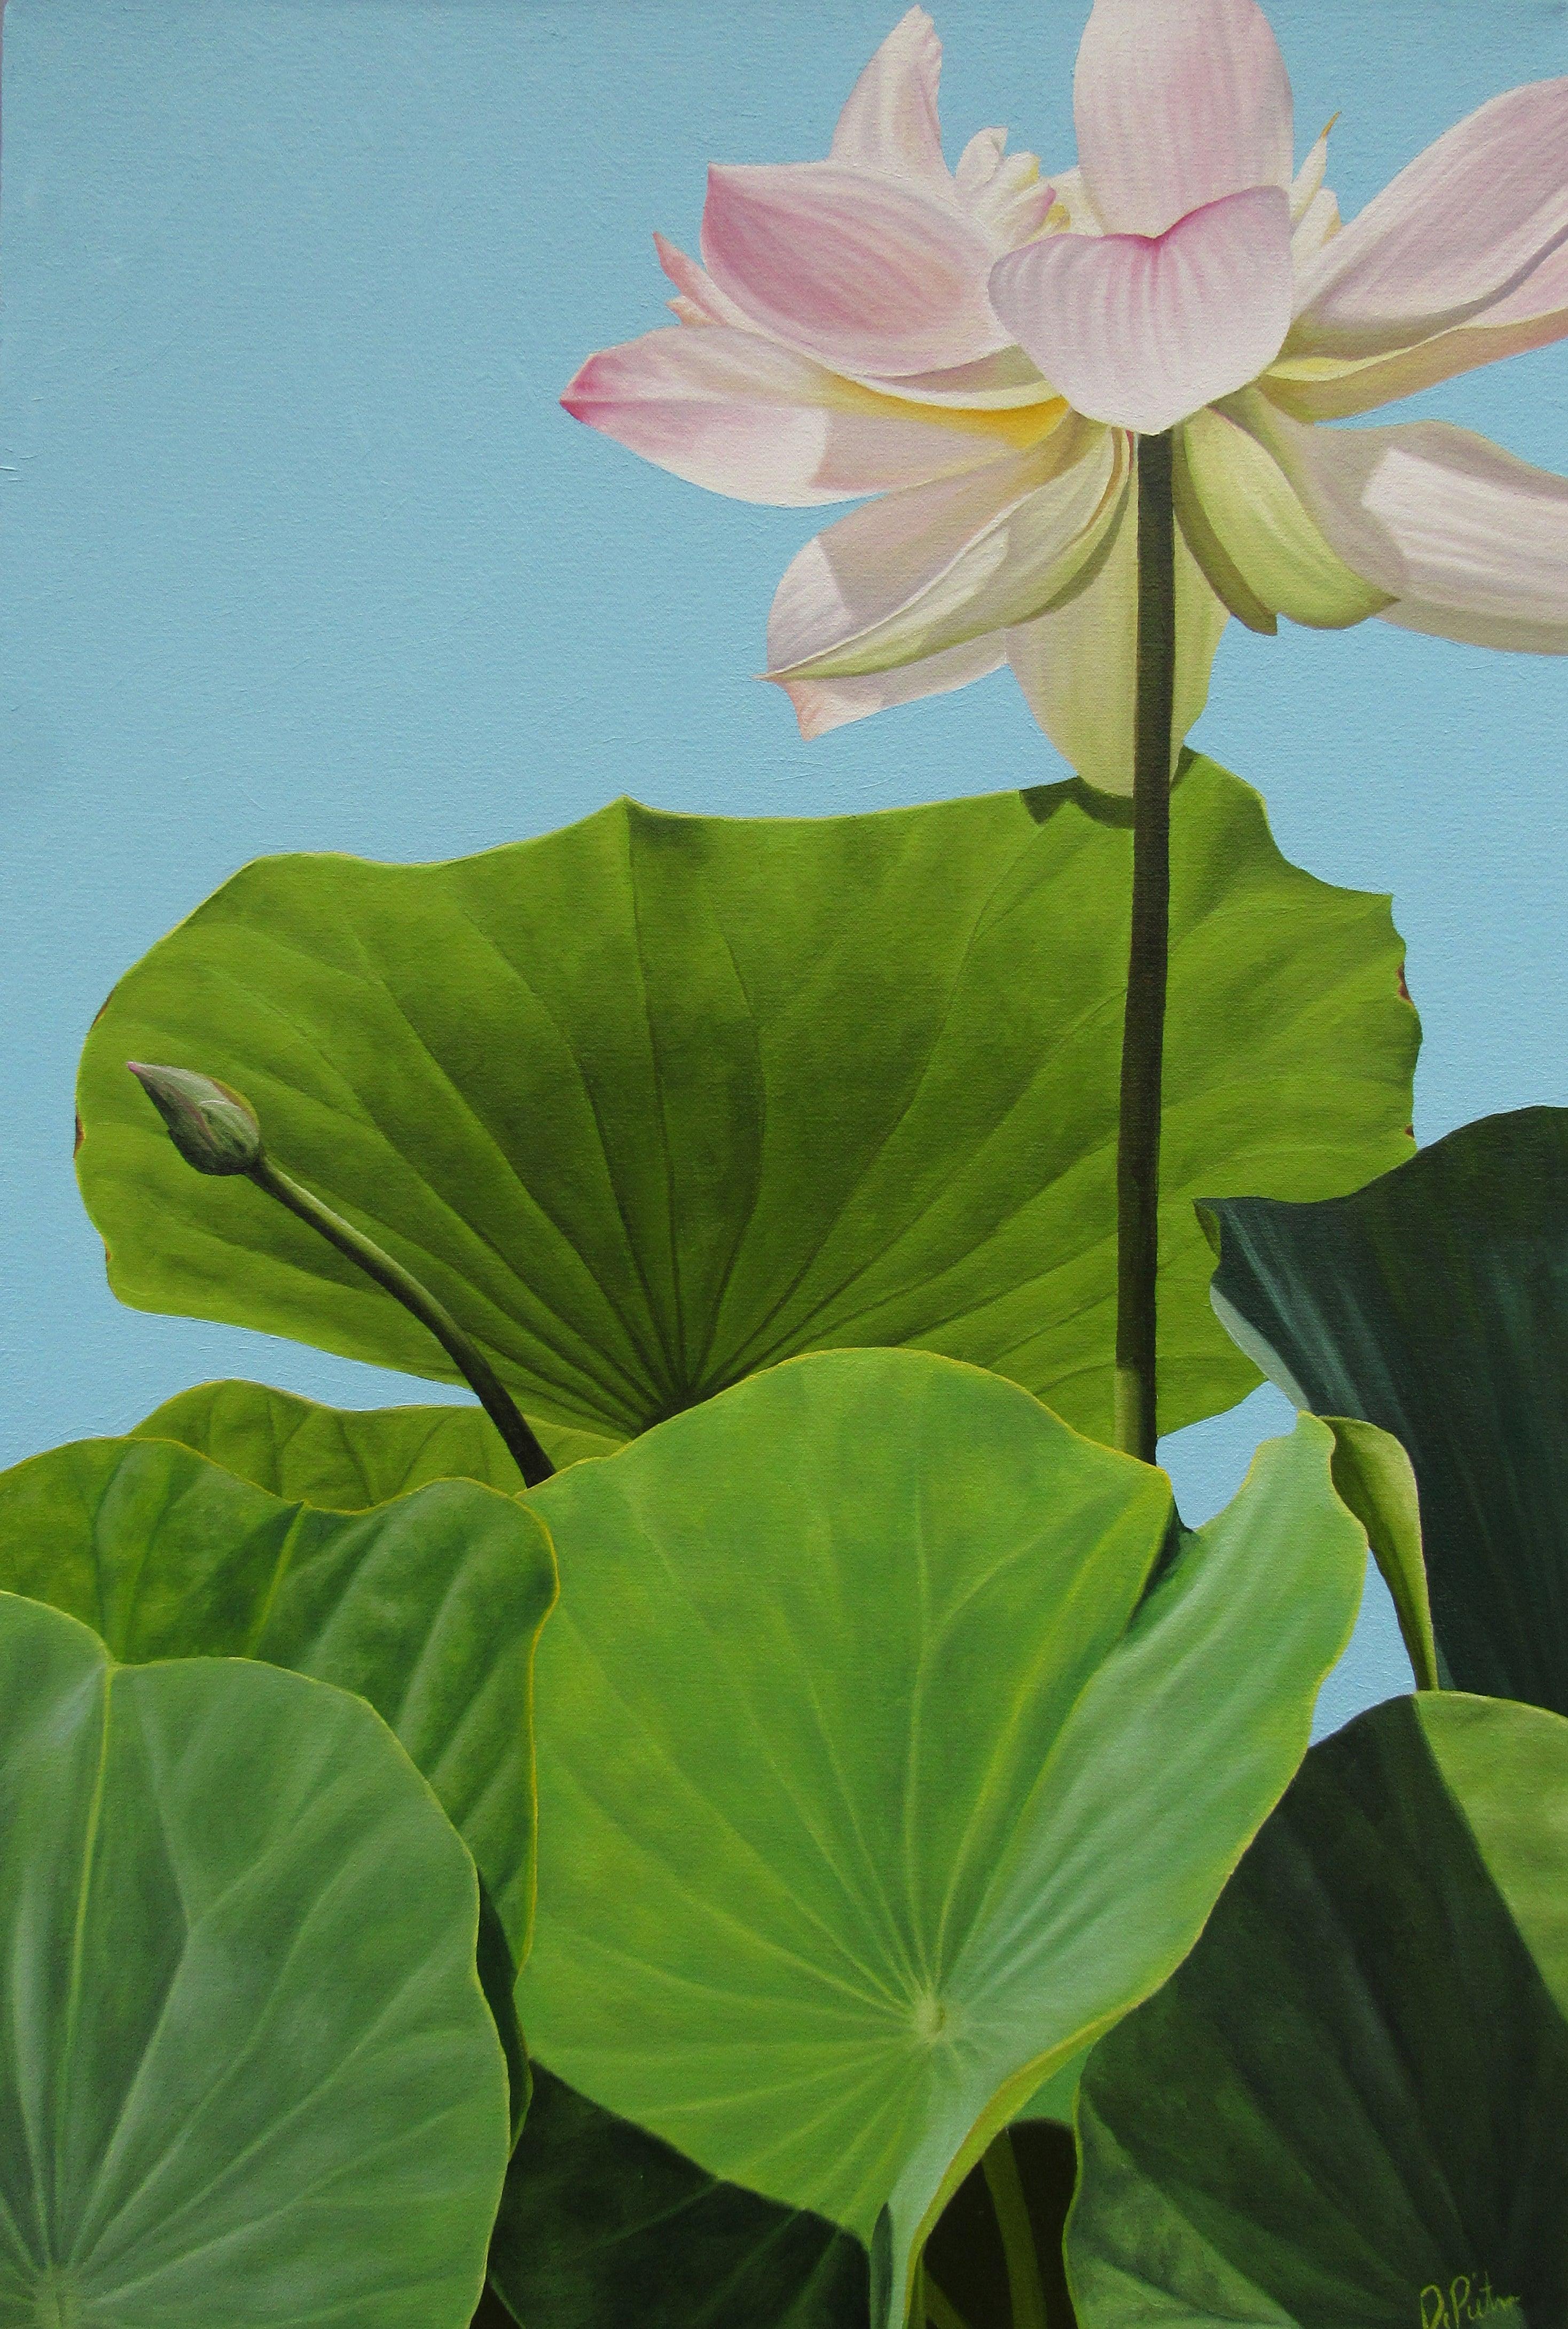 Frank dipietro lotus no 10 hard edge realist painting of white frank dipietro lotus no 10 hard edge realist painting of white lotus flower and leaves painting for sale at 1stdibs izmirmasajfo